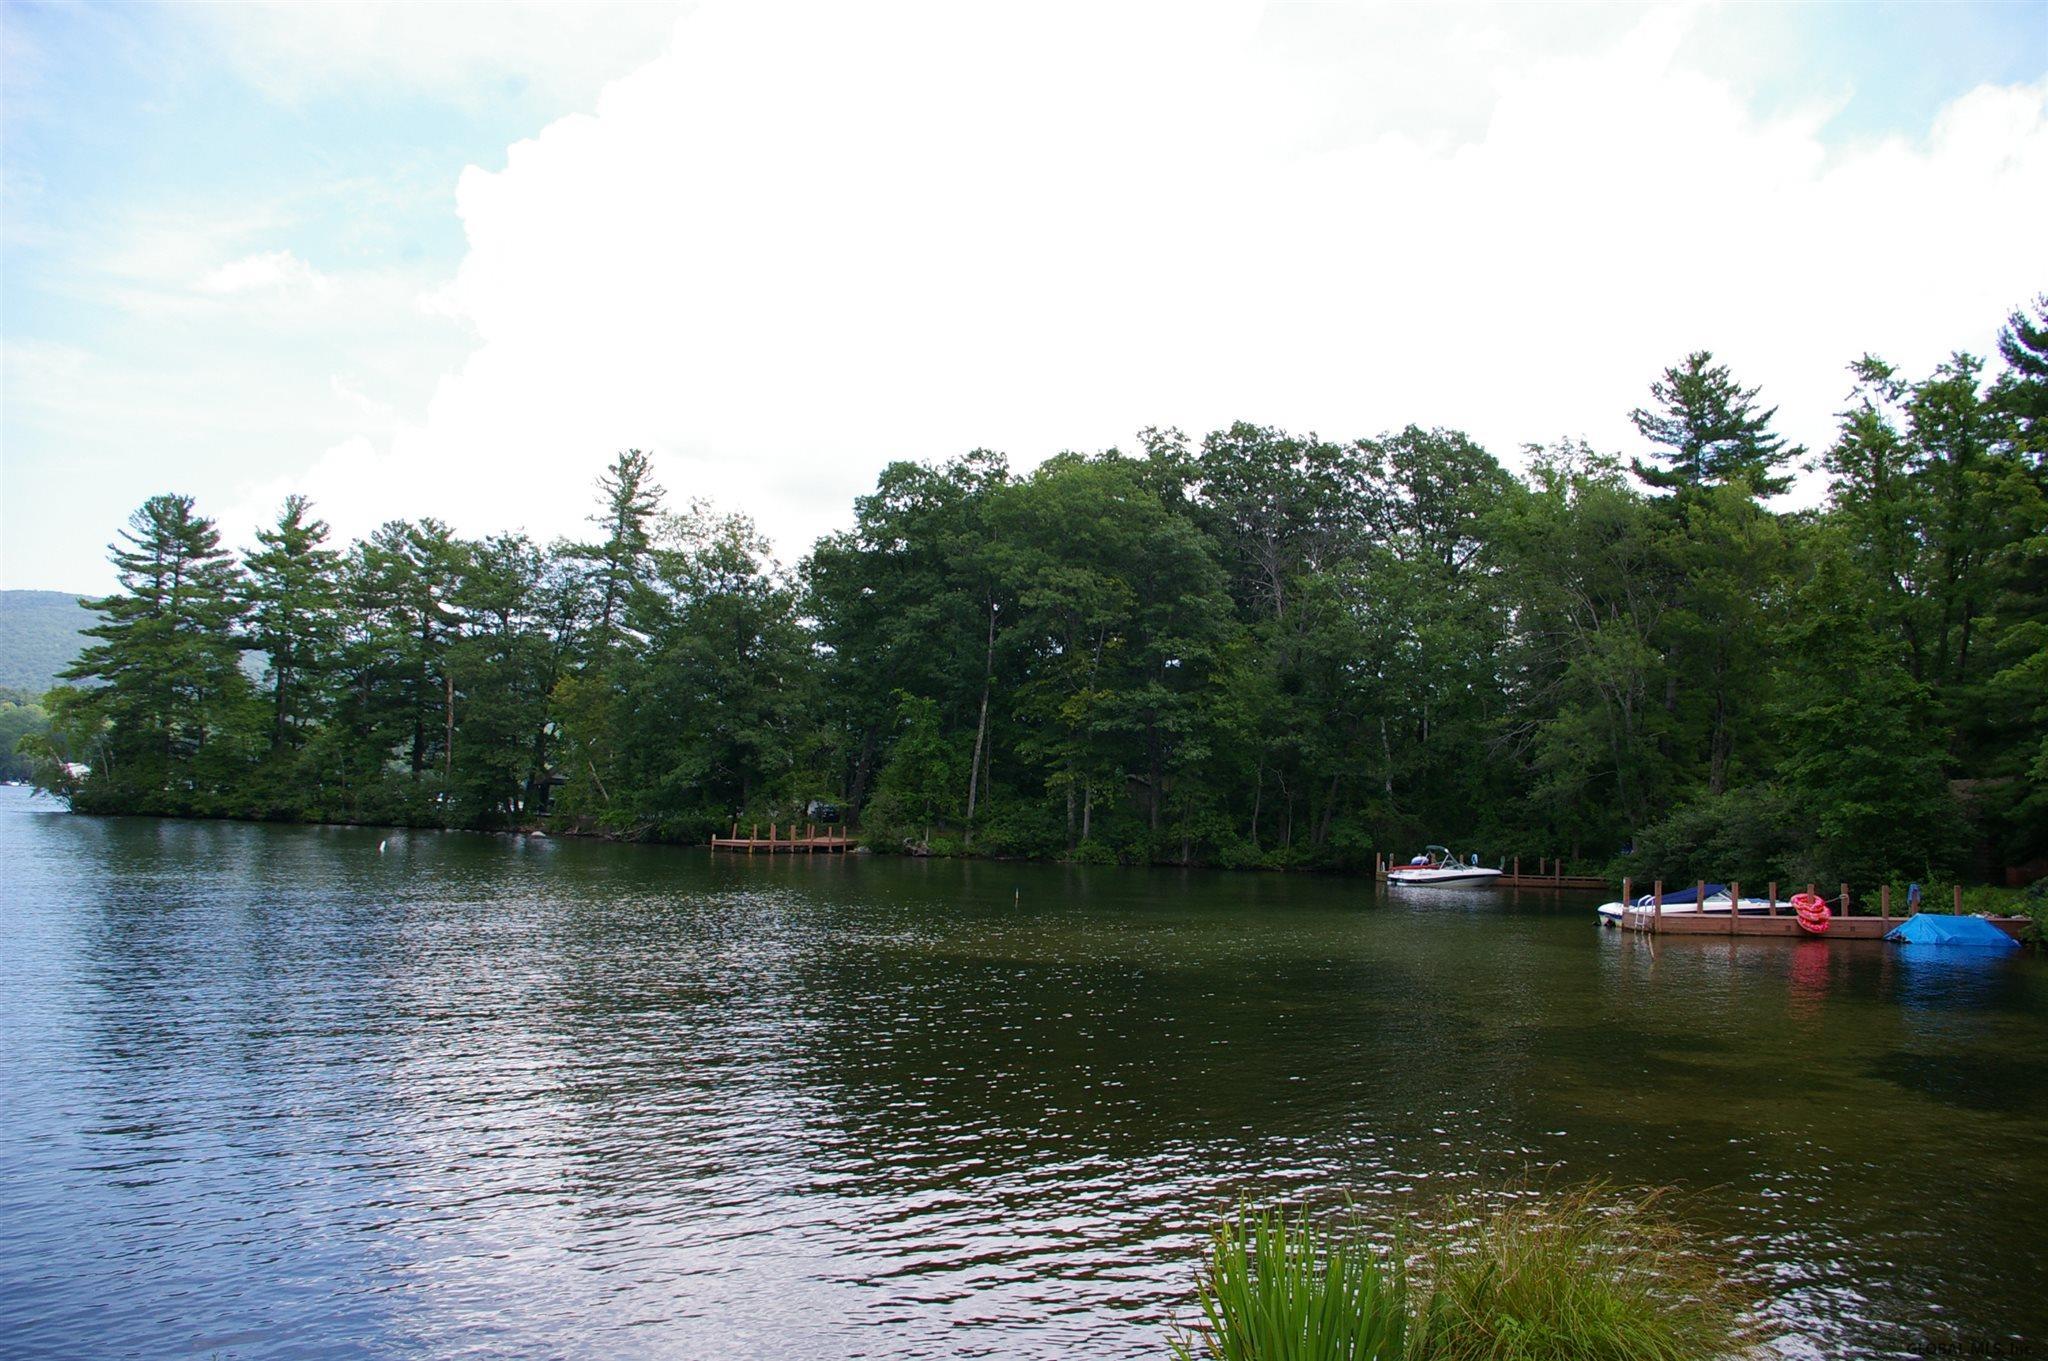 Lake George image 44